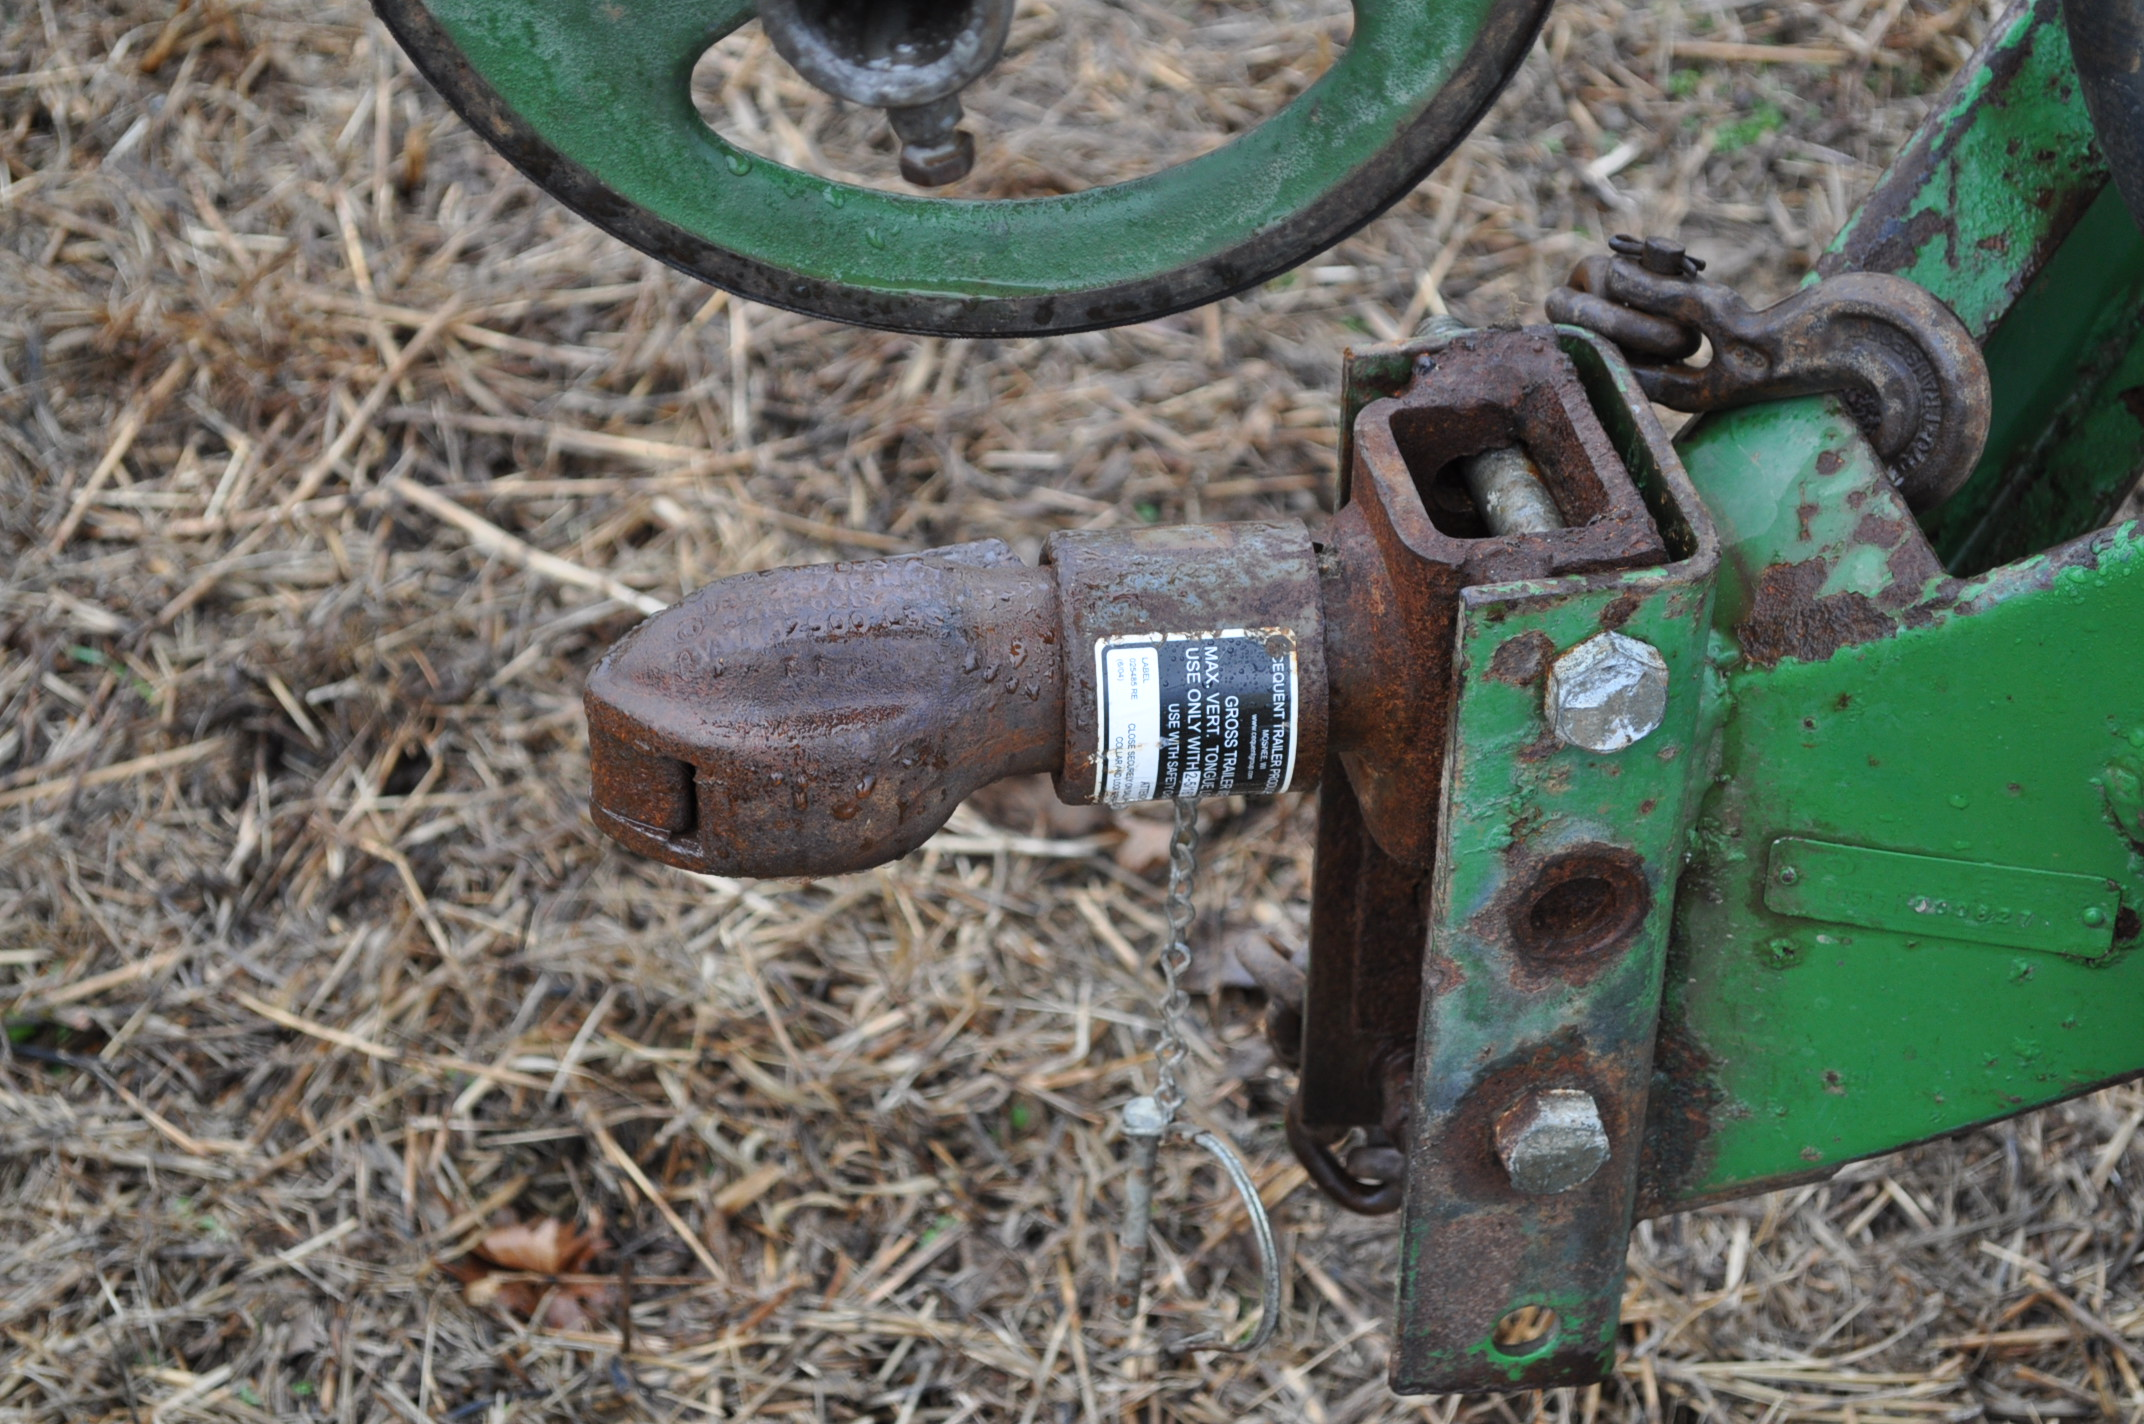 John Deere 535 pull-type sprayer, 350 gallon tank, 30' boom - Image 11 of 11